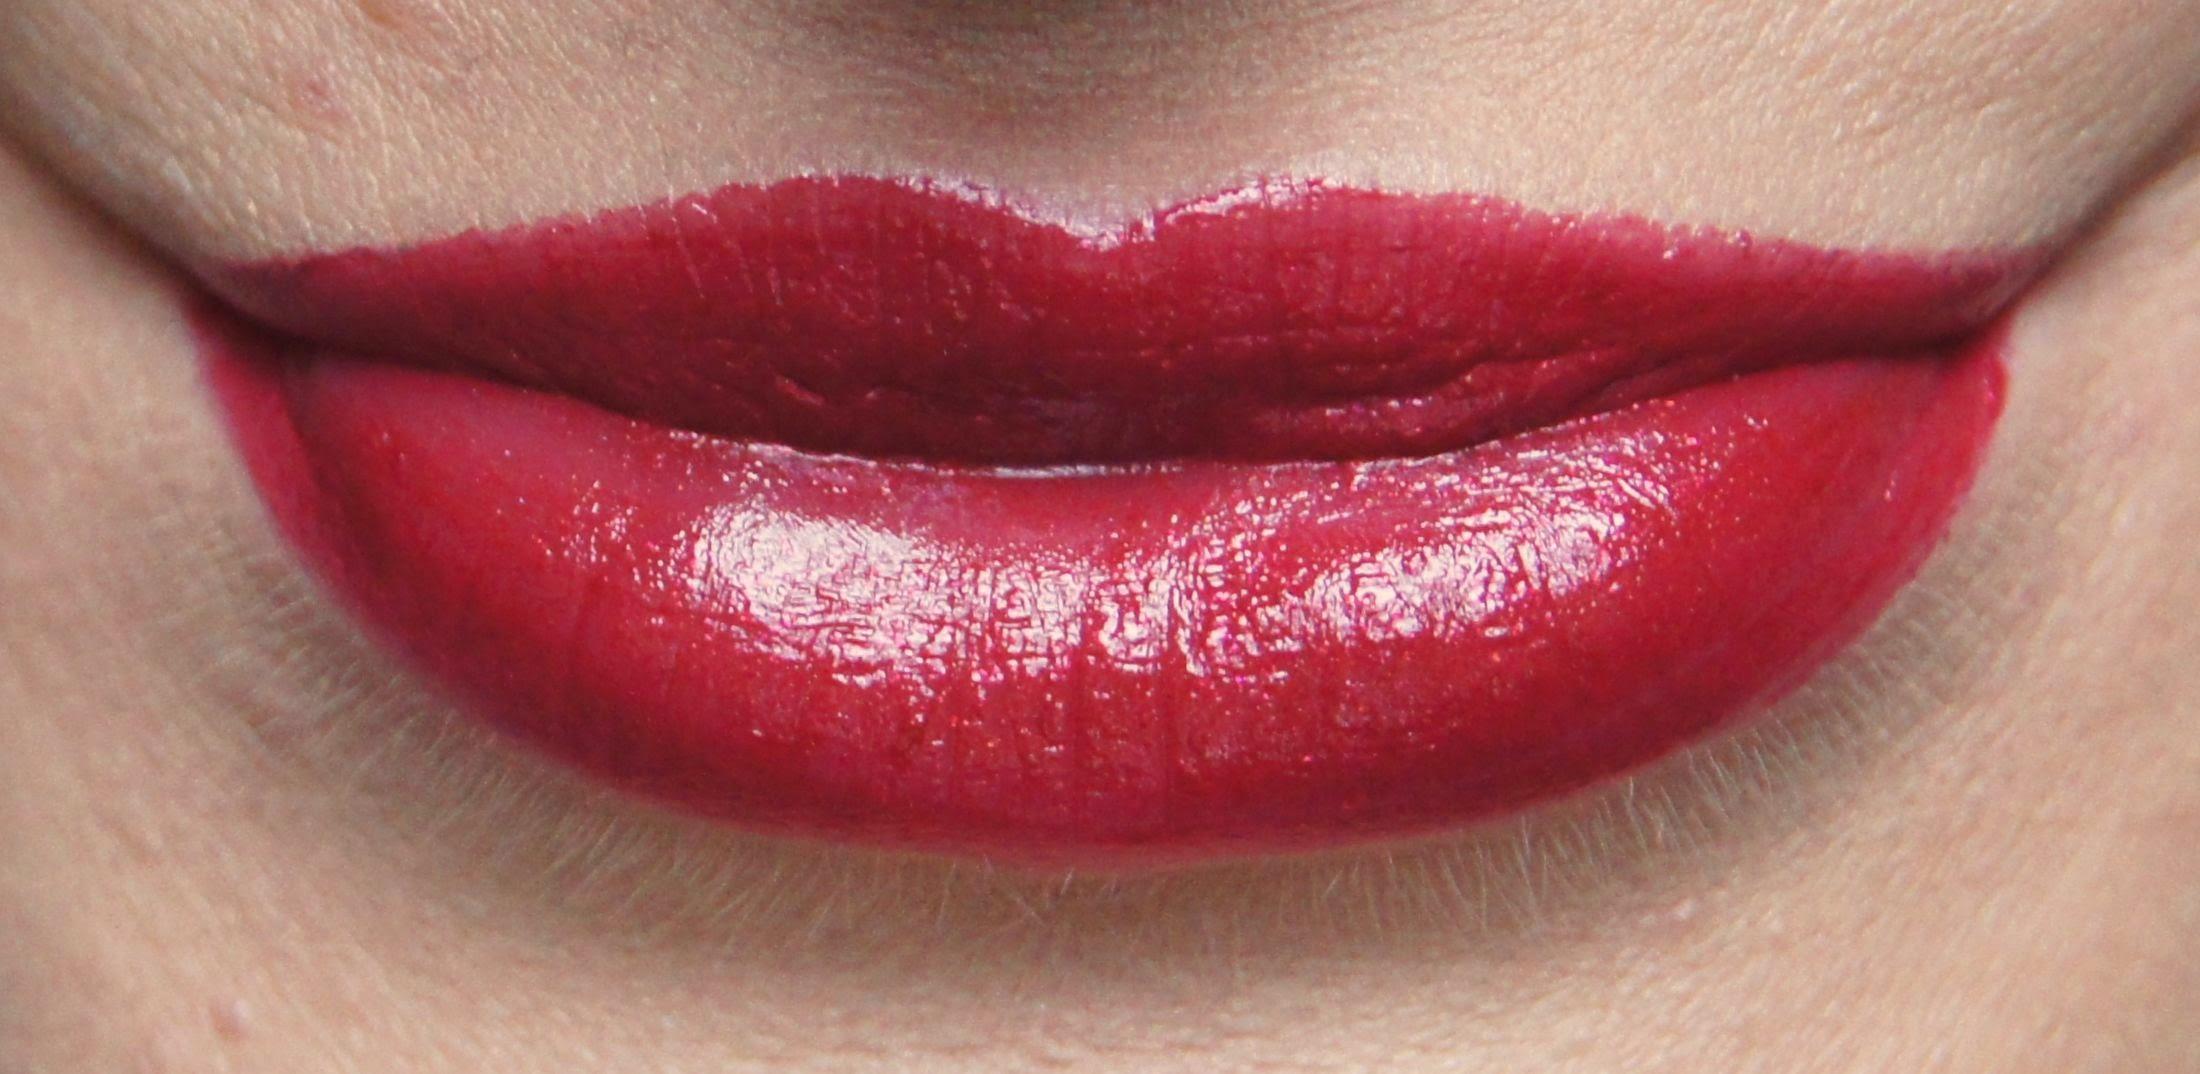 estee lauder pure color vivid shine lipstick forbidden apple swatch review